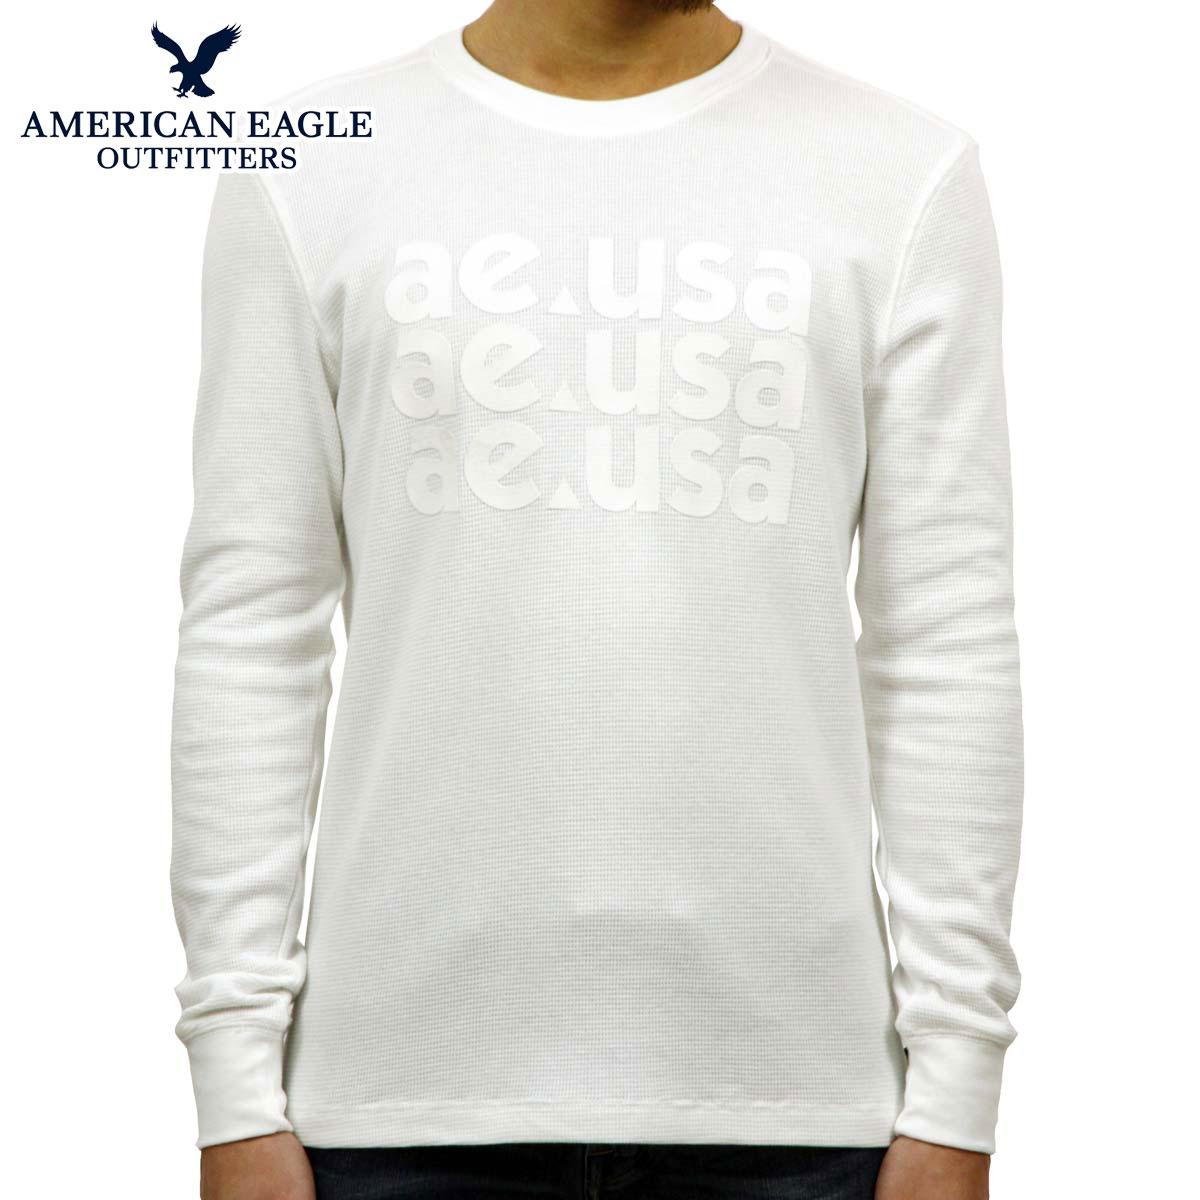 f067002e0 American eagle AMERICAN EAGLE regular article men thermal crew neck long  sleeves T-shirt Ron ...